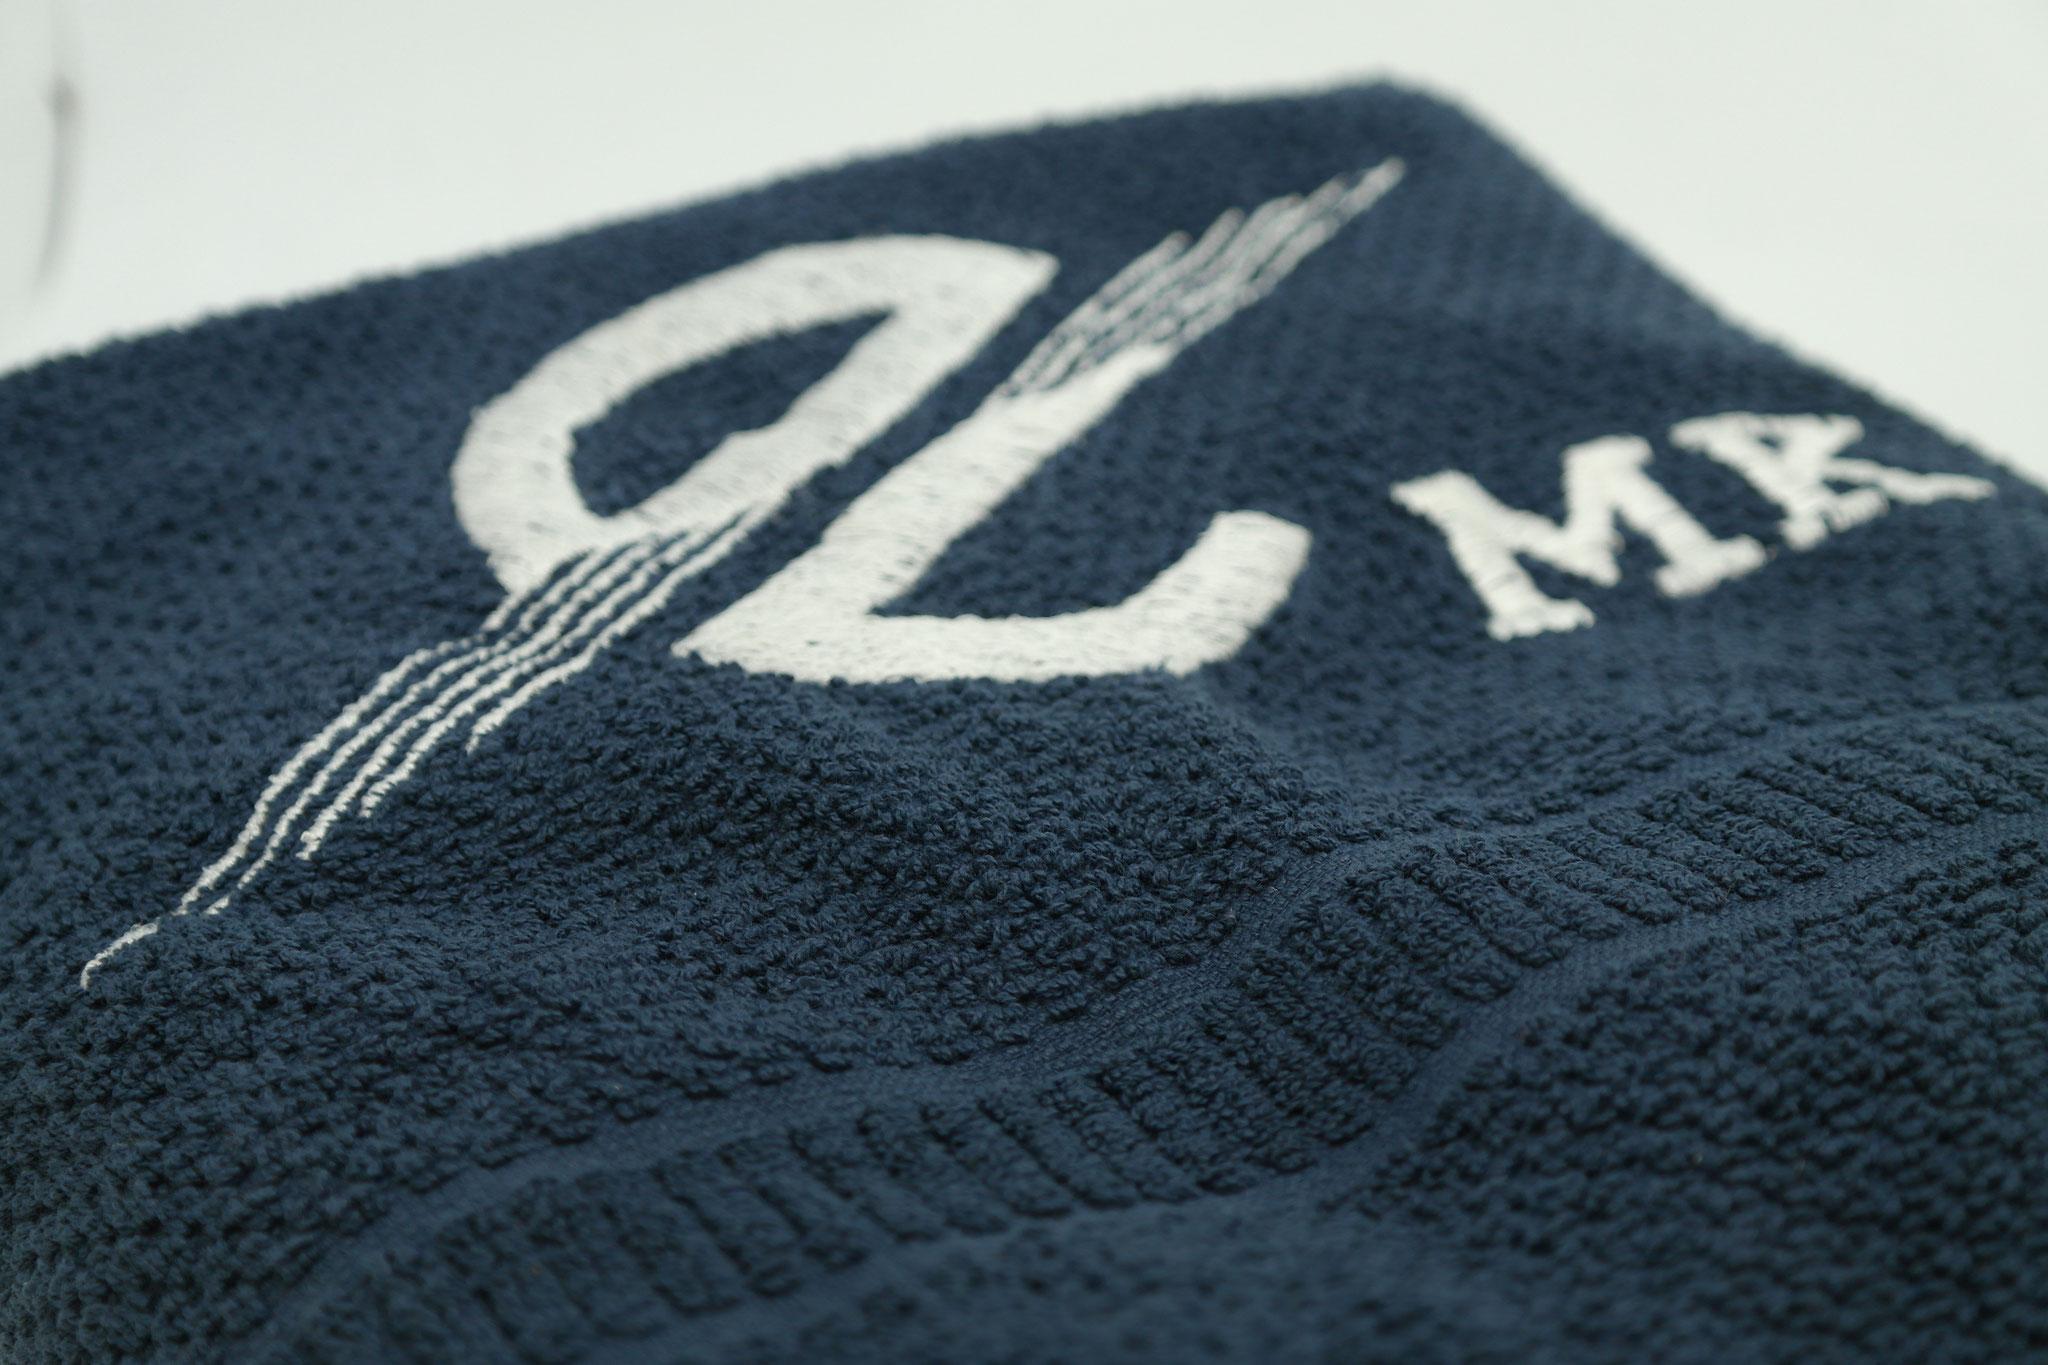 gestickte Handtücher mit Vereinsname, Logo, Trikotnummer oder Initialen